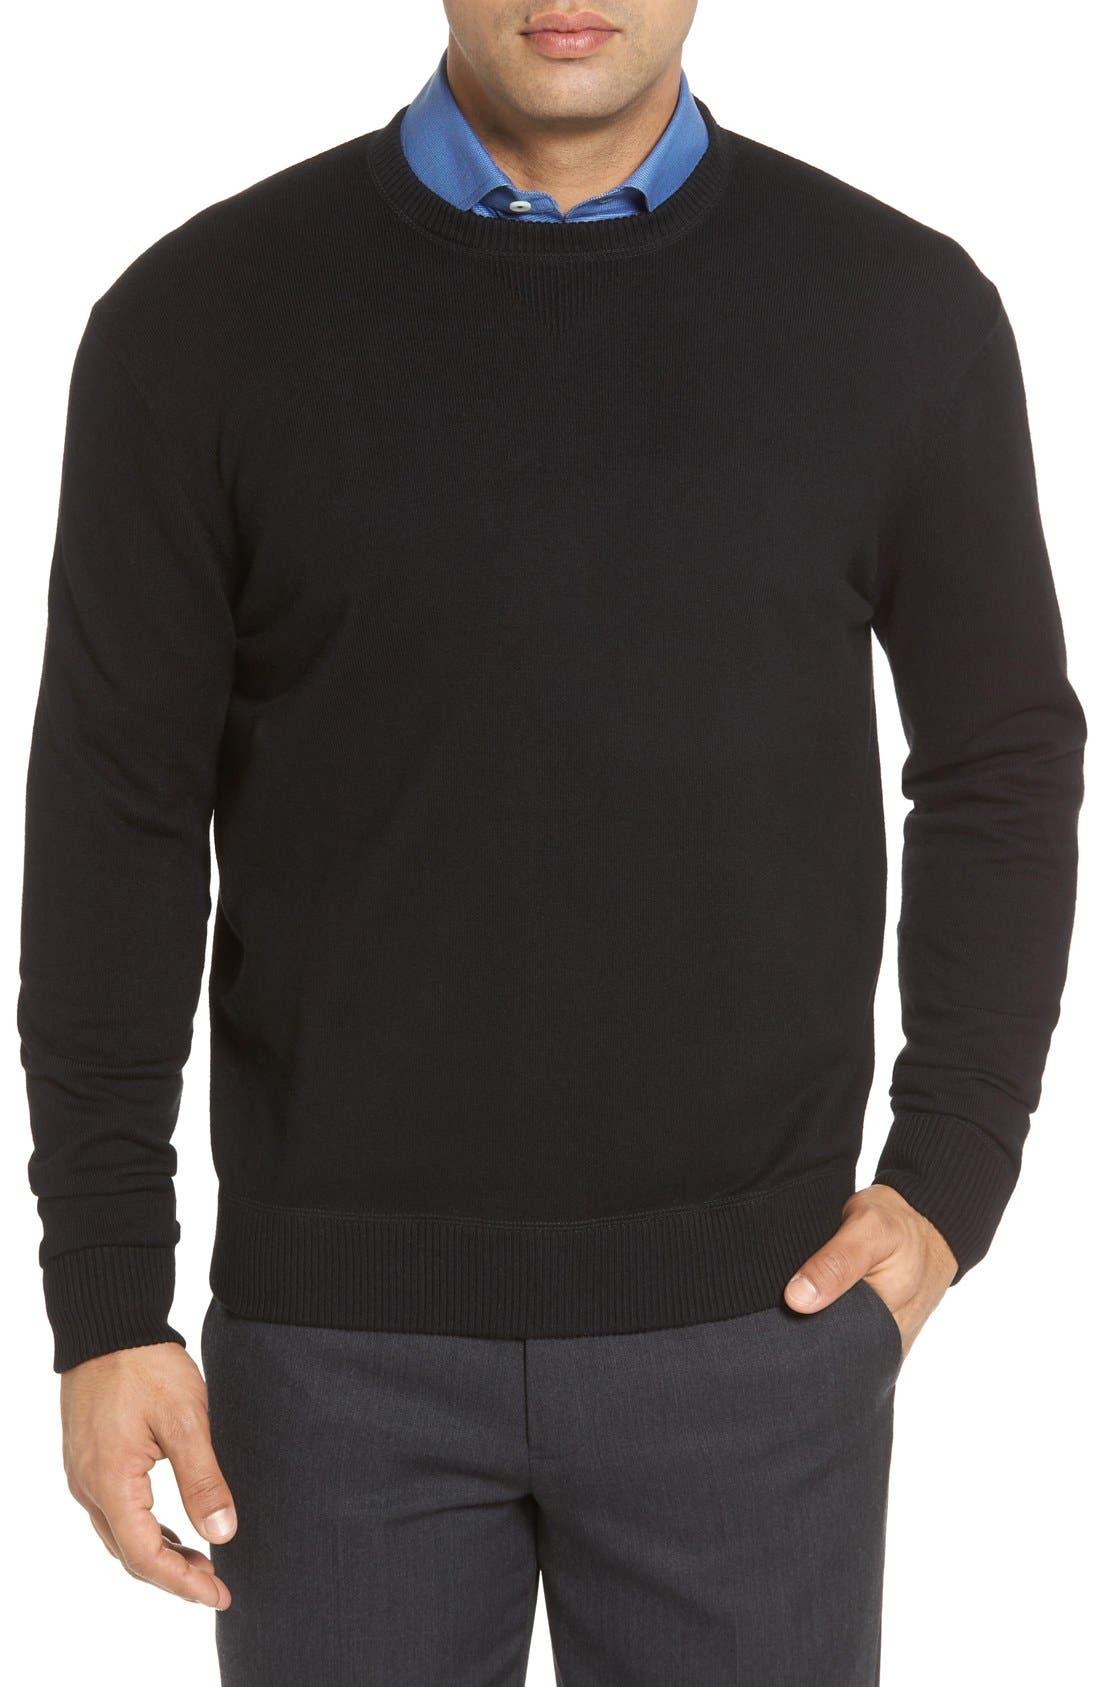 Alternate Image 1 Selected - Robert Talbott 'Jersey Sport' Cotton Blend Crewneck Sweater